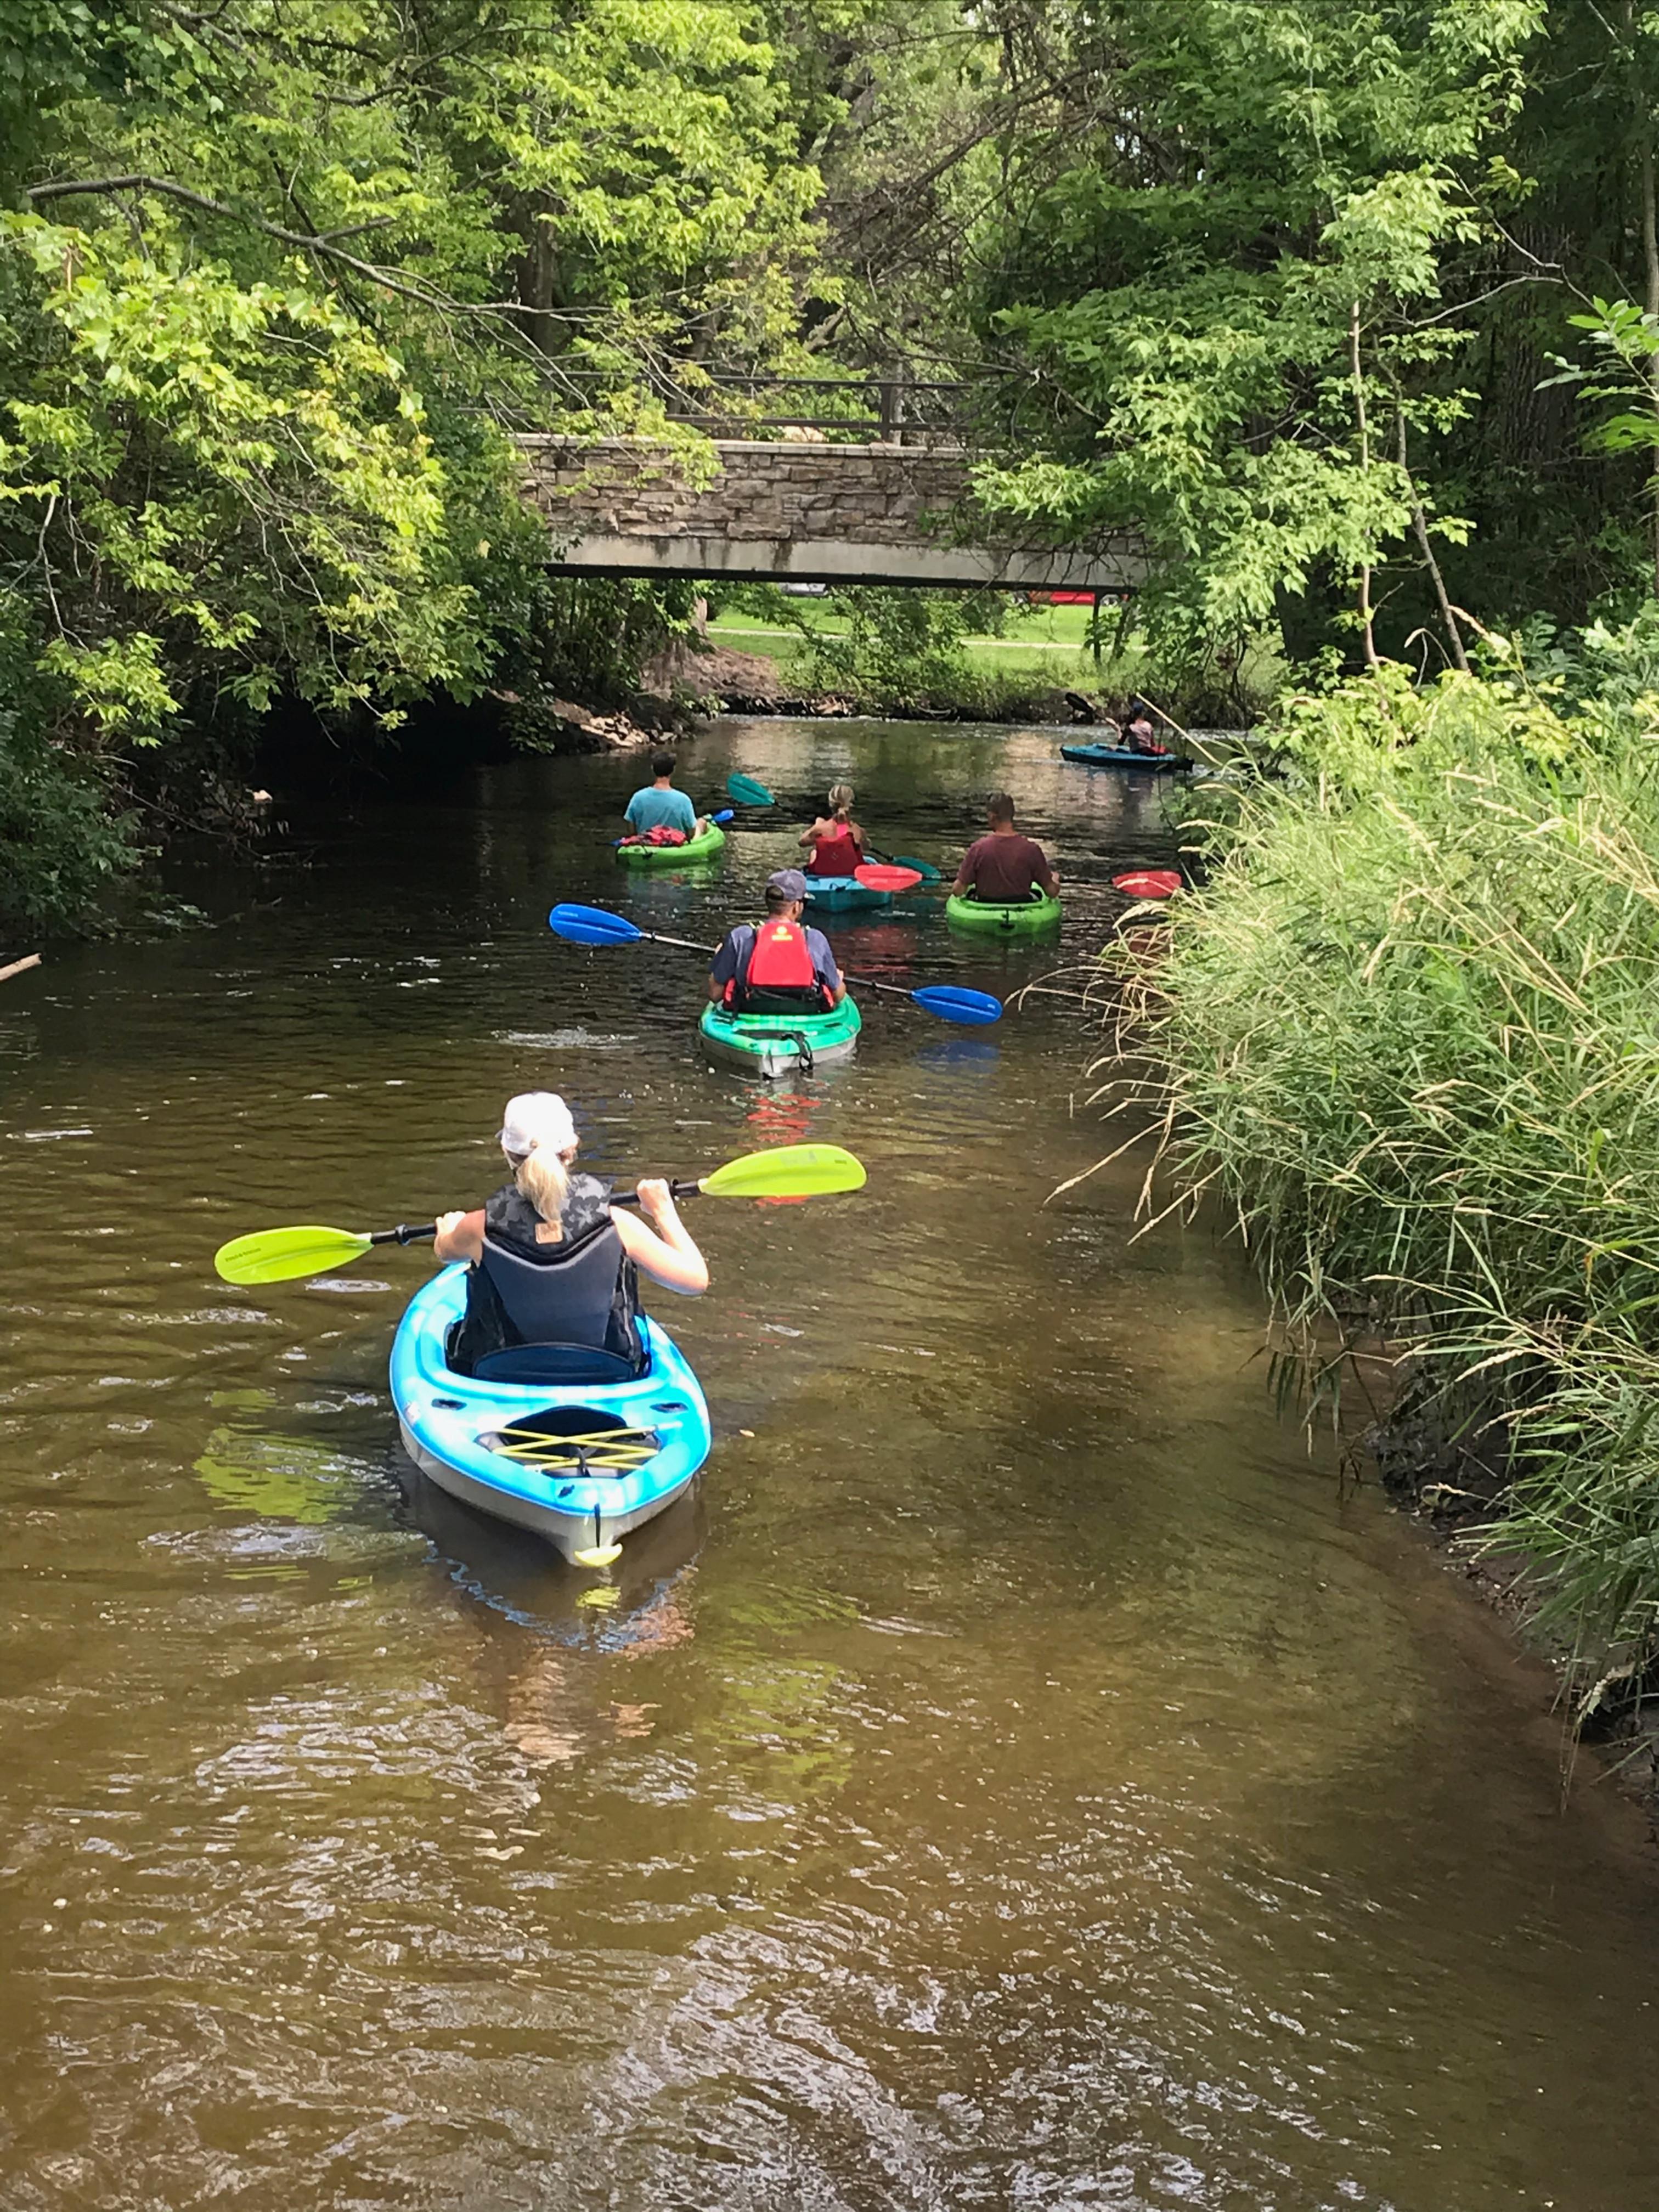 2.5 - 3 Hour Full Service Kayak Rental